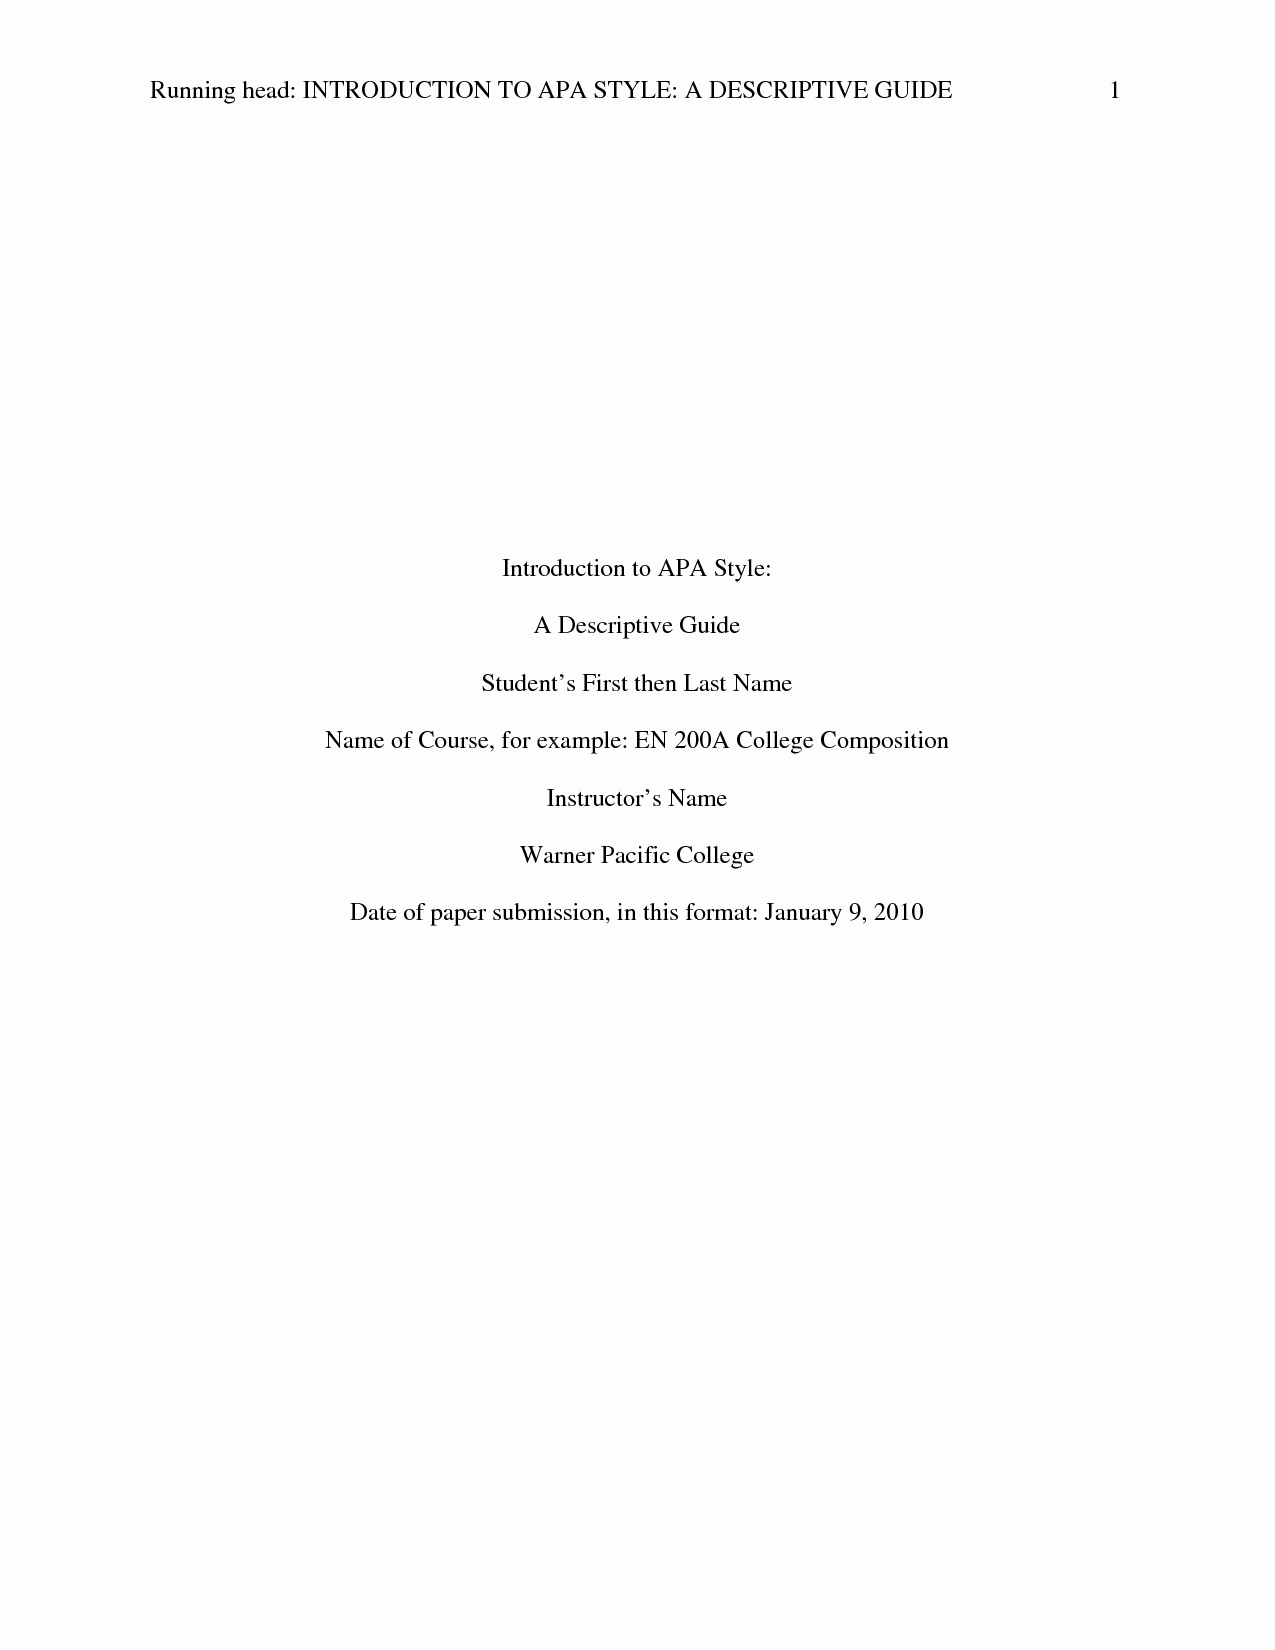 Apa format Paper 6th Edition Beautiful Apa Paper Template